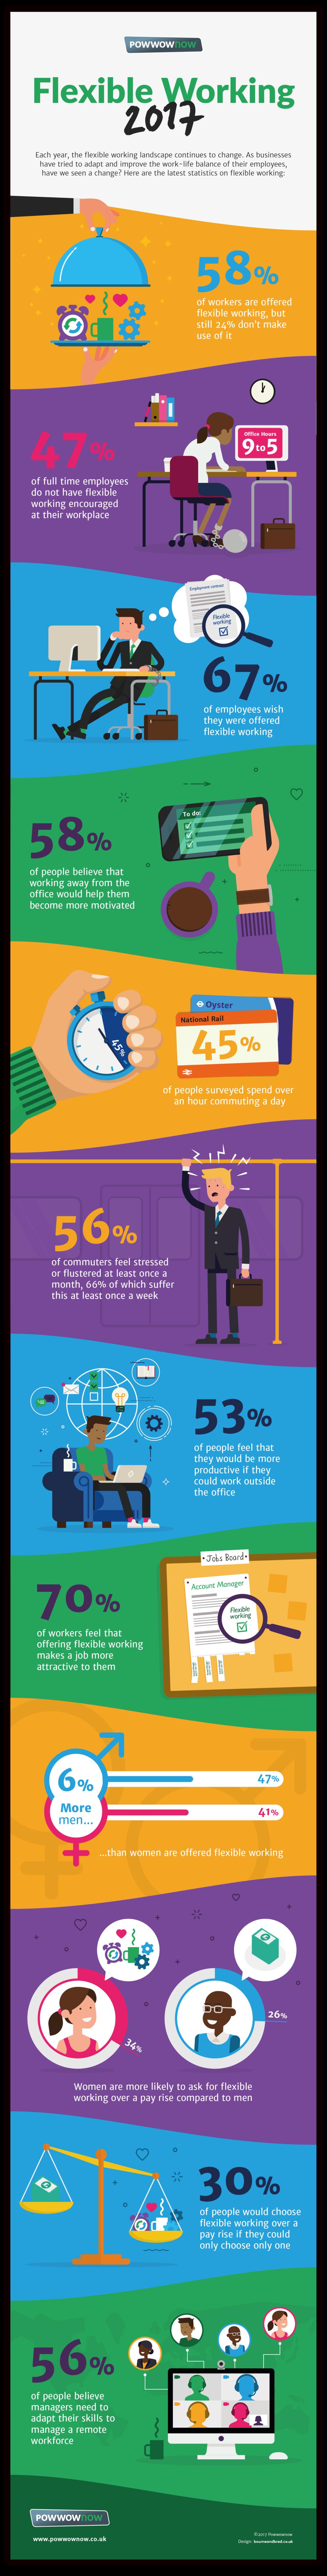 Powwownow_flexible_working_infographic